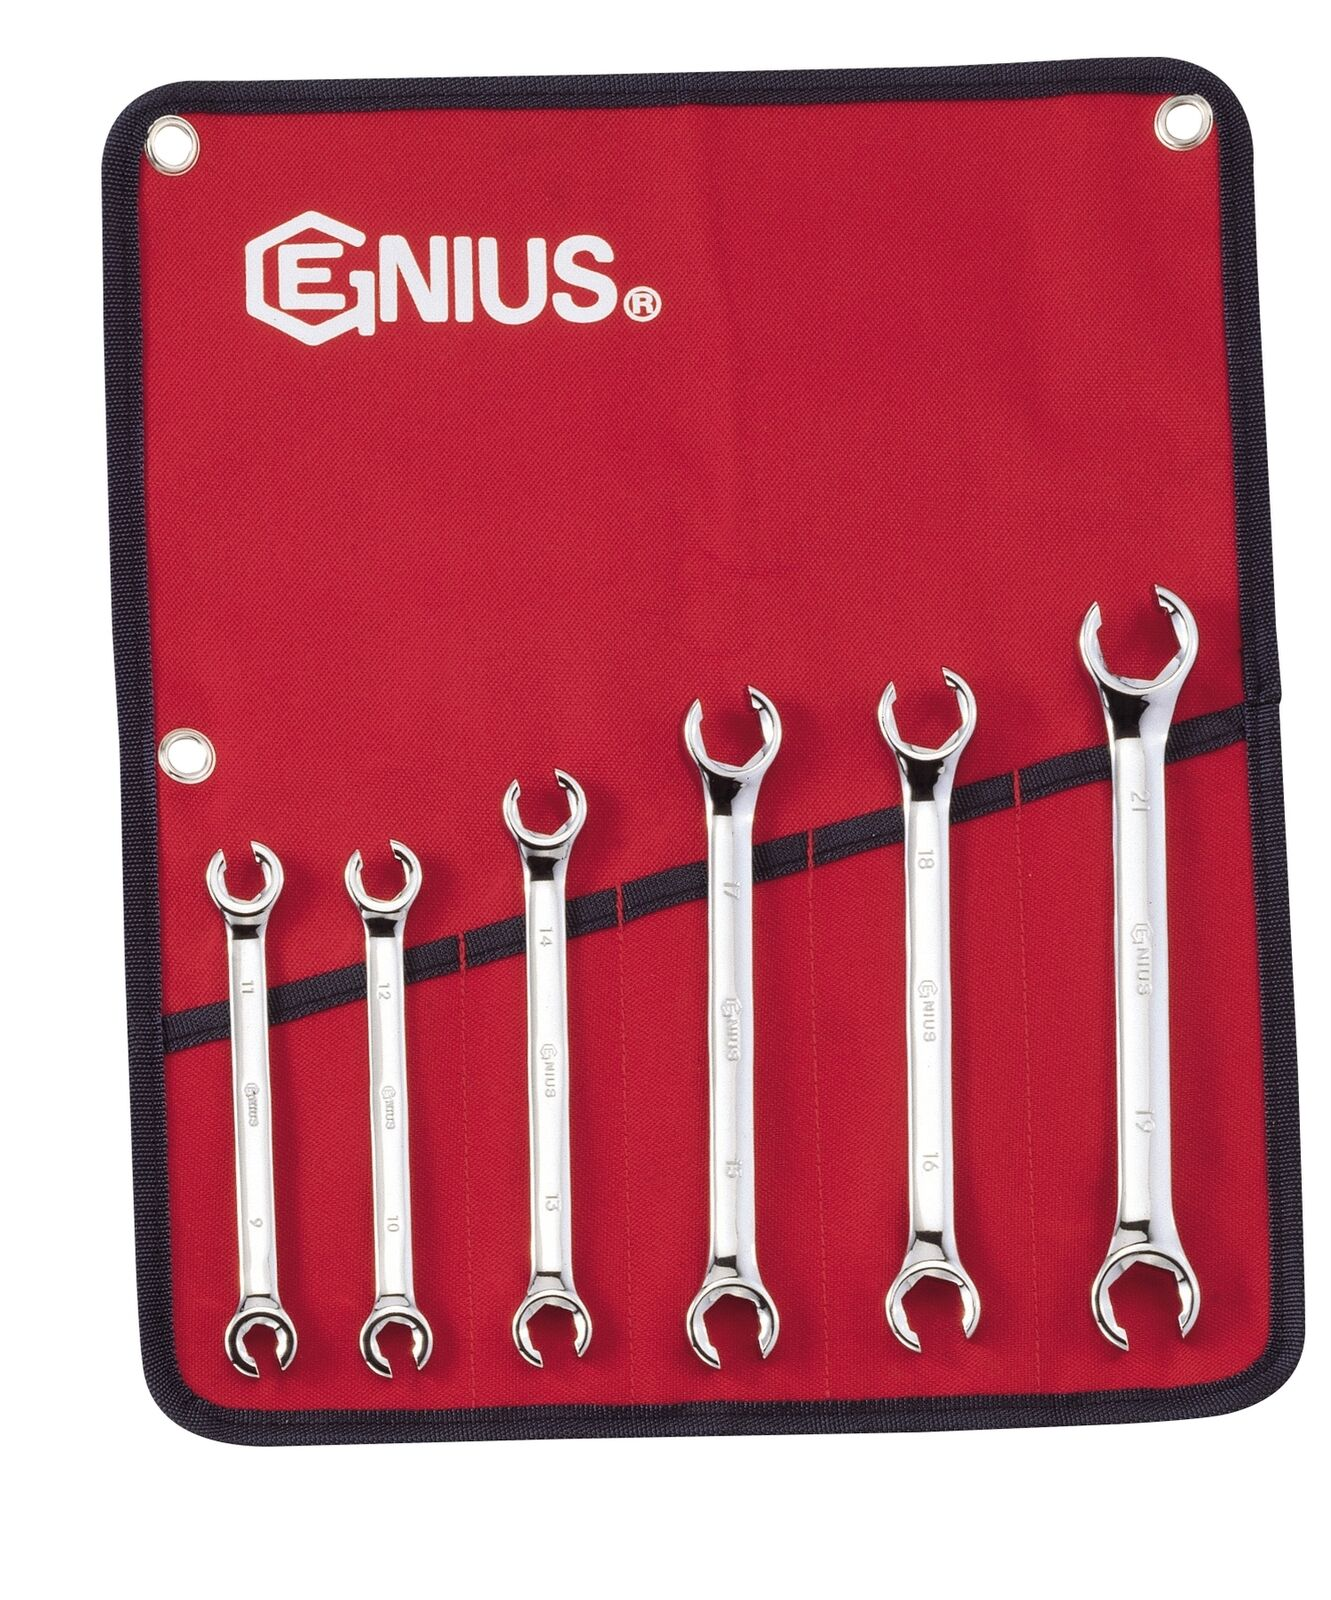 Genius Tools 6PC Metric Flare Nut Wrench Set - FN-006M